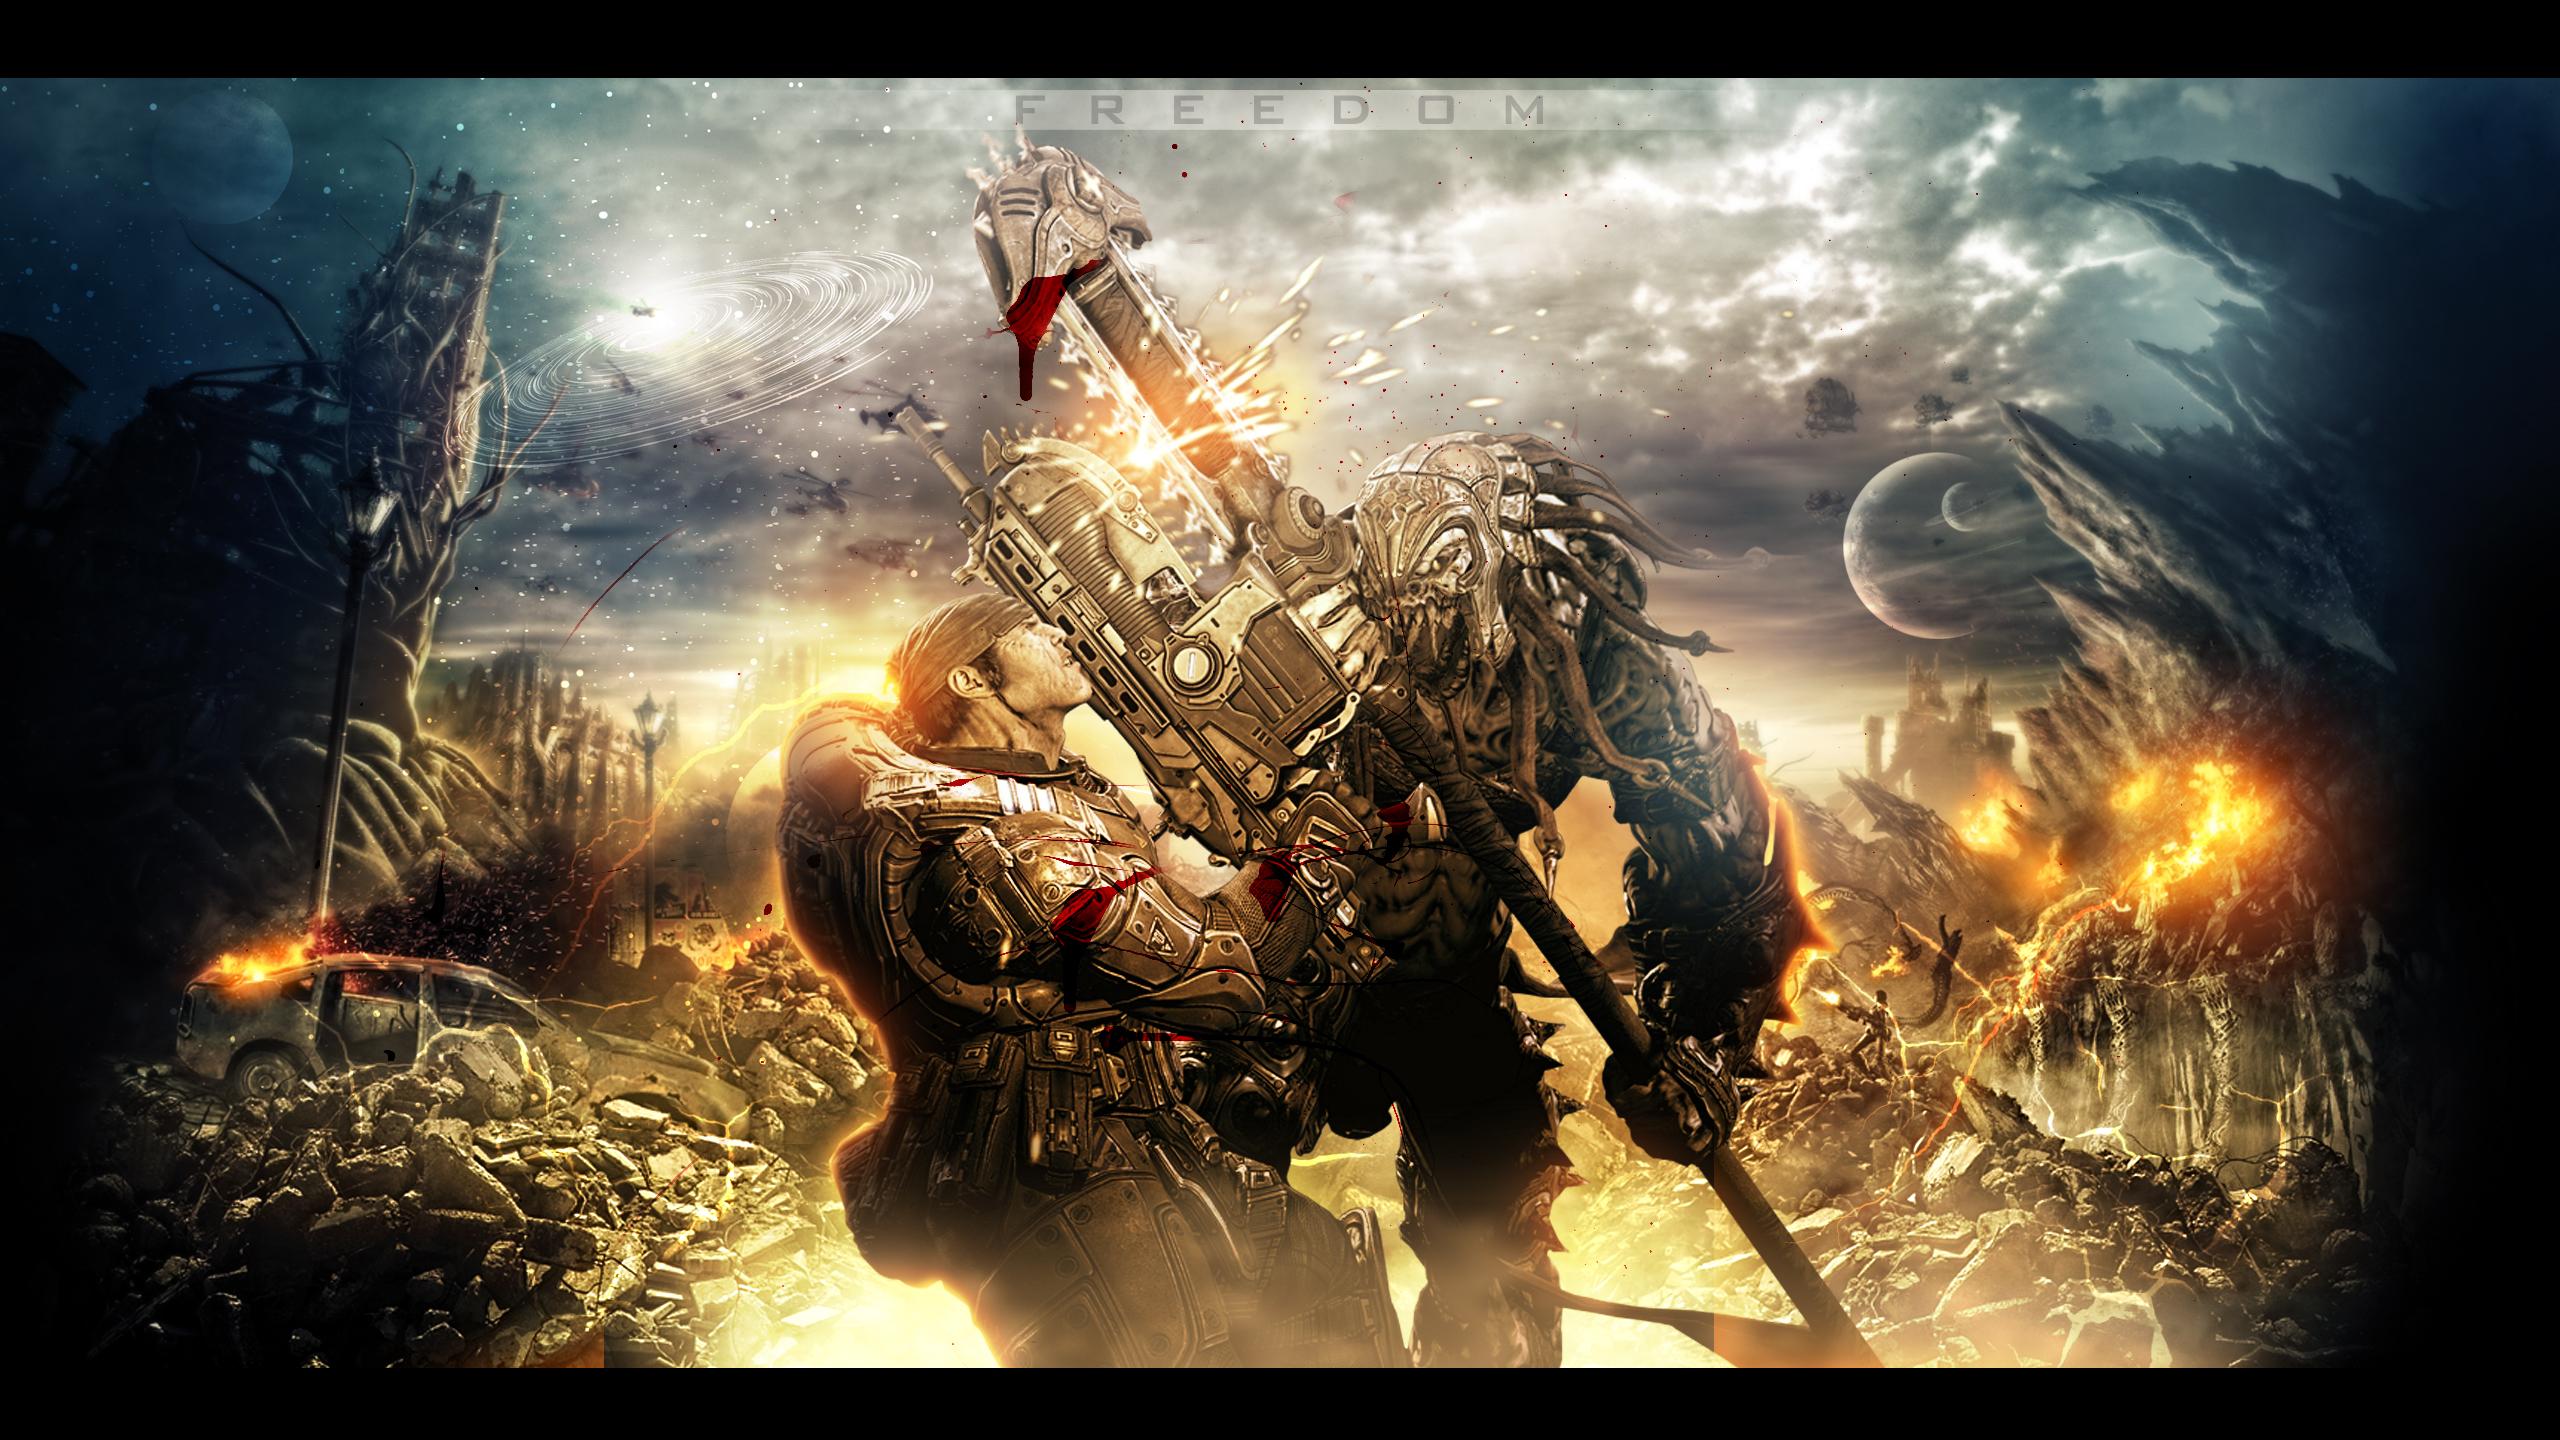 gears of war 3 backgrounds - sf wallpaper